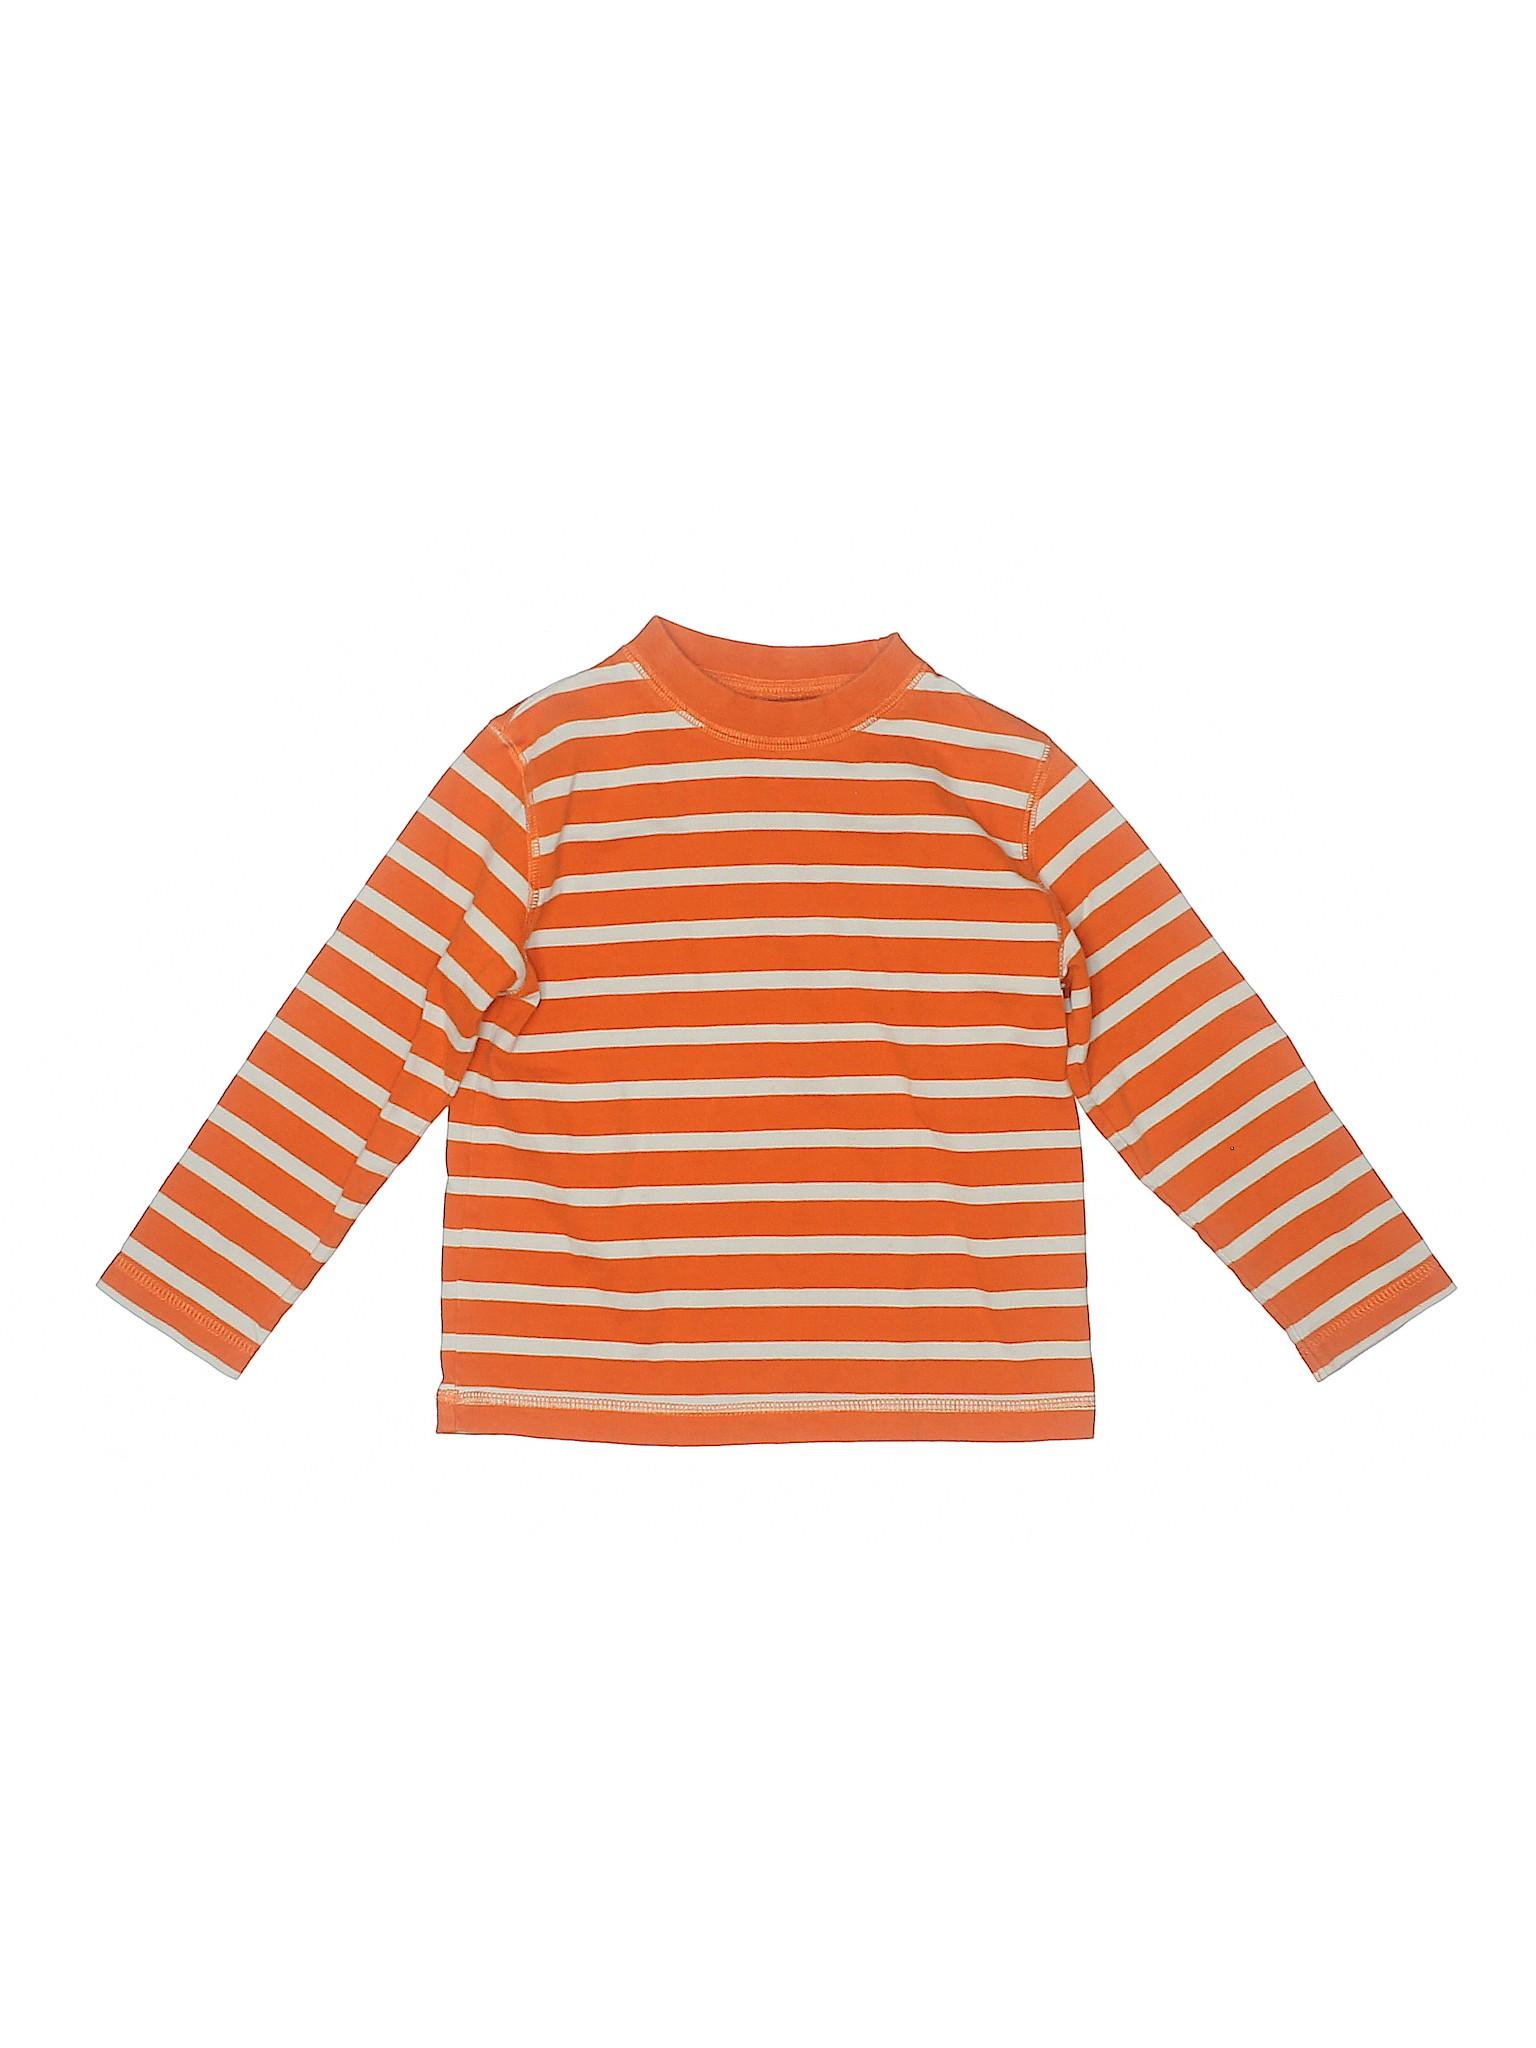 Topomini Infant/'S ORANGE LION l//s pull over Sweater